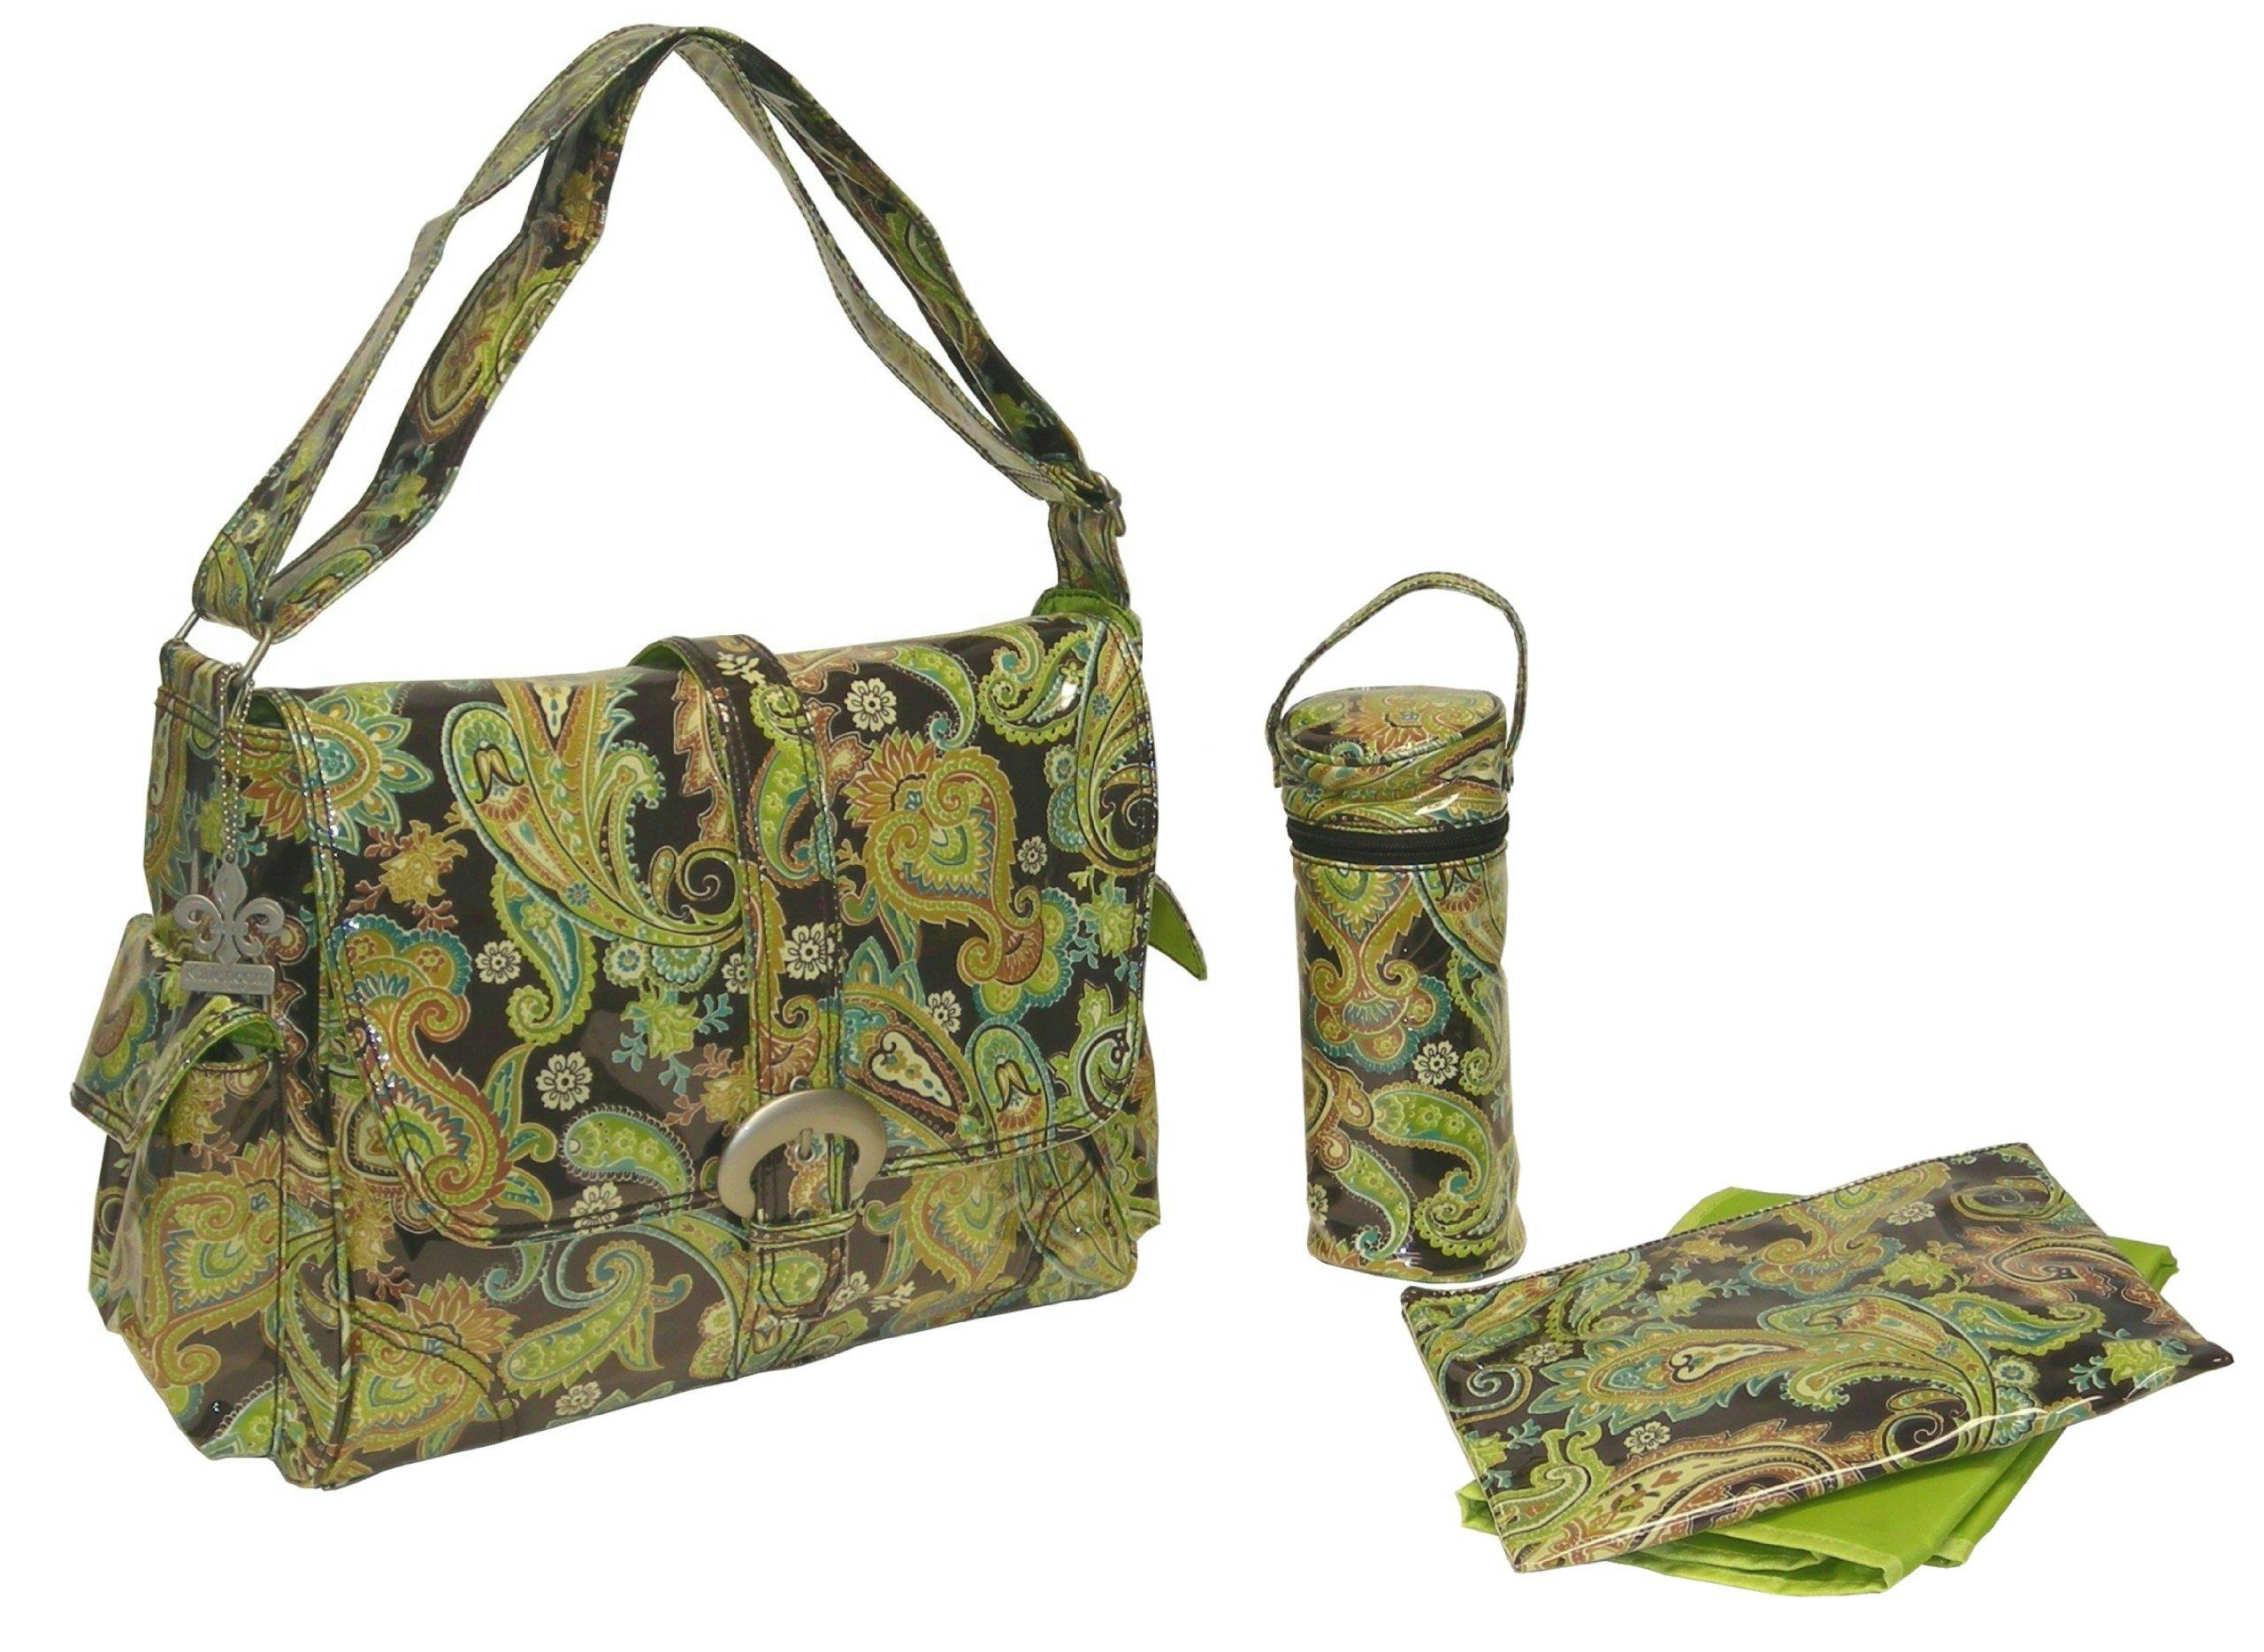 Kalencom Laminated Buckle Bag, Multi Paisley Pistachio